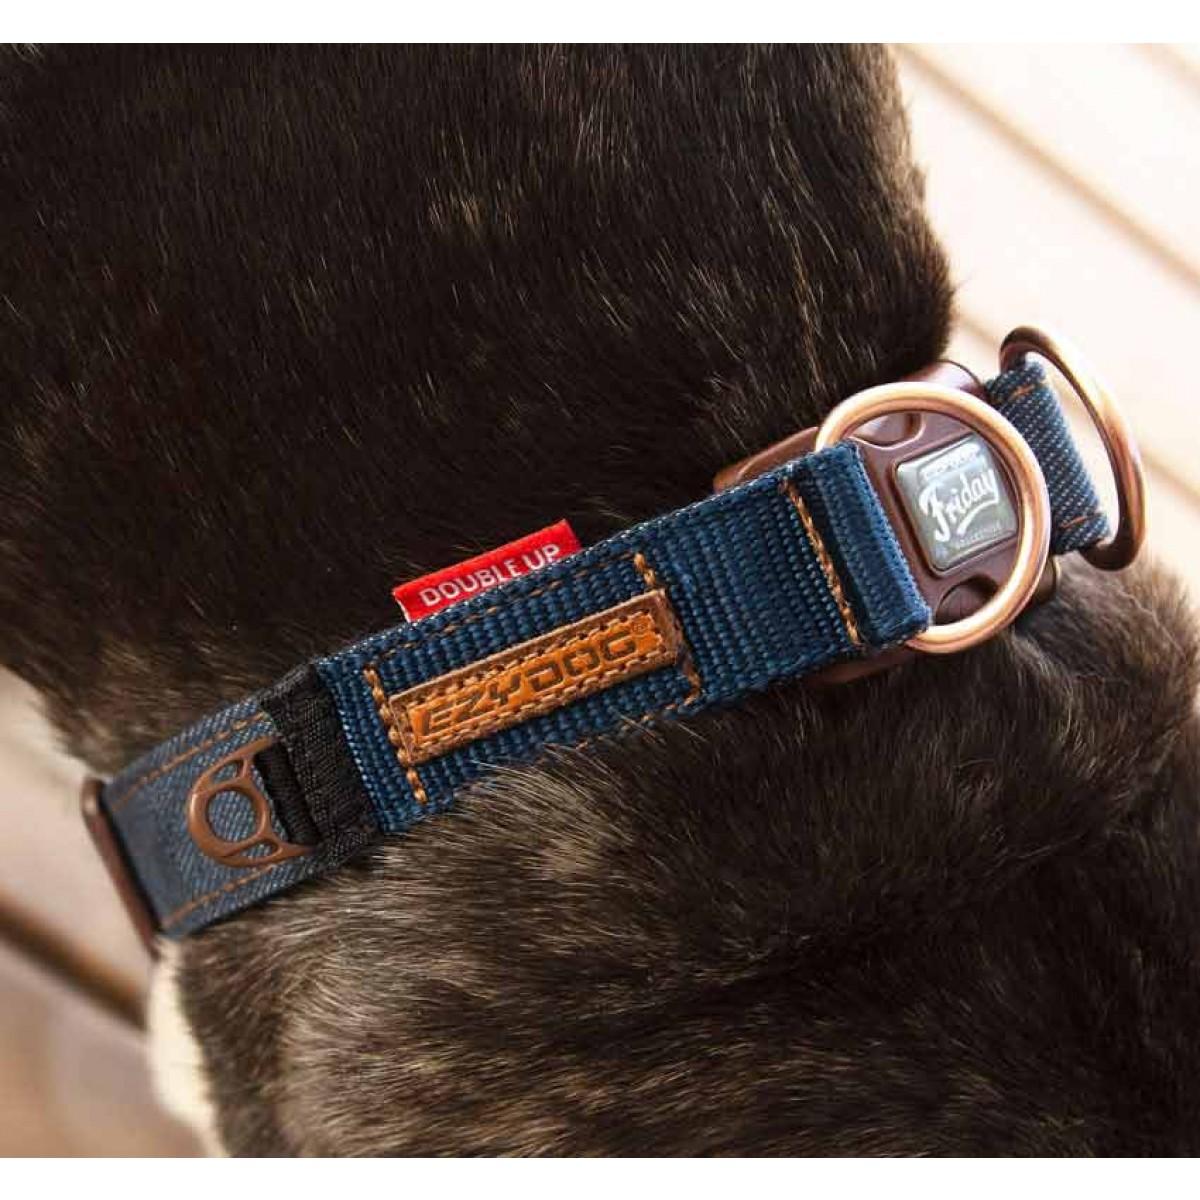 Ezydog Denim Double Up Dog Collar Secure Dog Collar